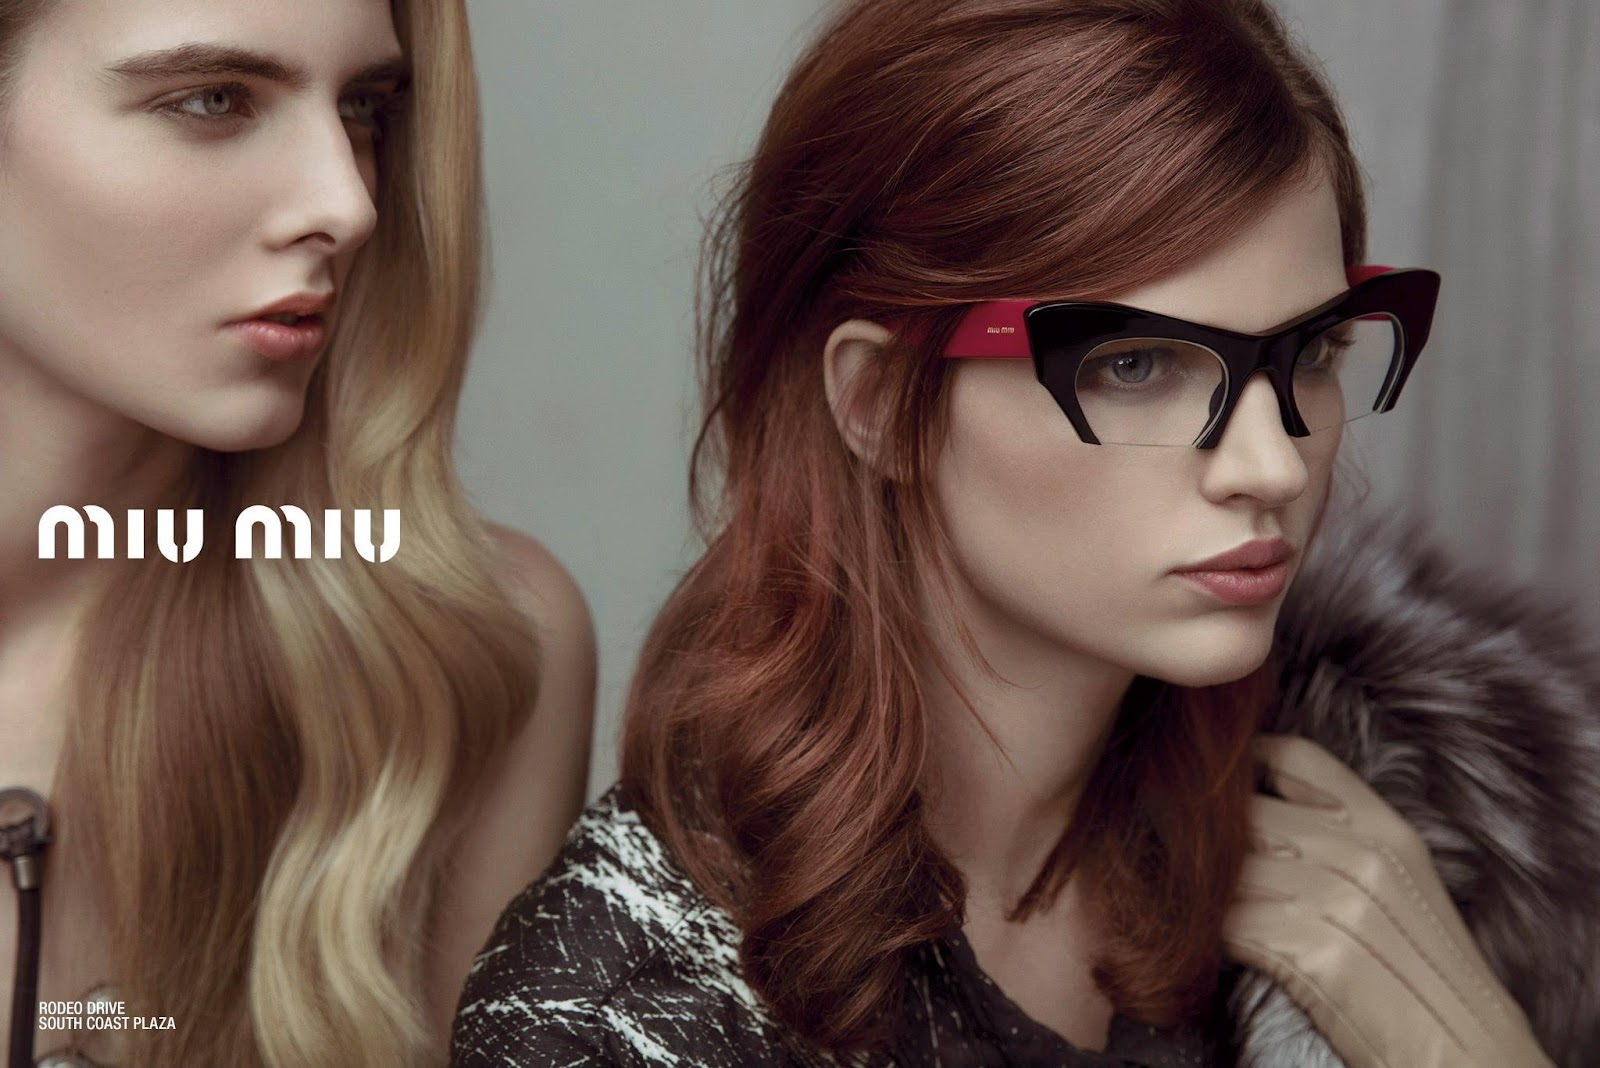 http://1.bp.blogspot.com/-SI74UtYFYzM/UNVWSXVwB6I/AAAAAAAAVPQ/ckMpaGCVt_I/s1600/Miu+Miu+Spring+13+Eyewear+by+Inez+and+Vinoodh+from+tfs+-+3.jpg